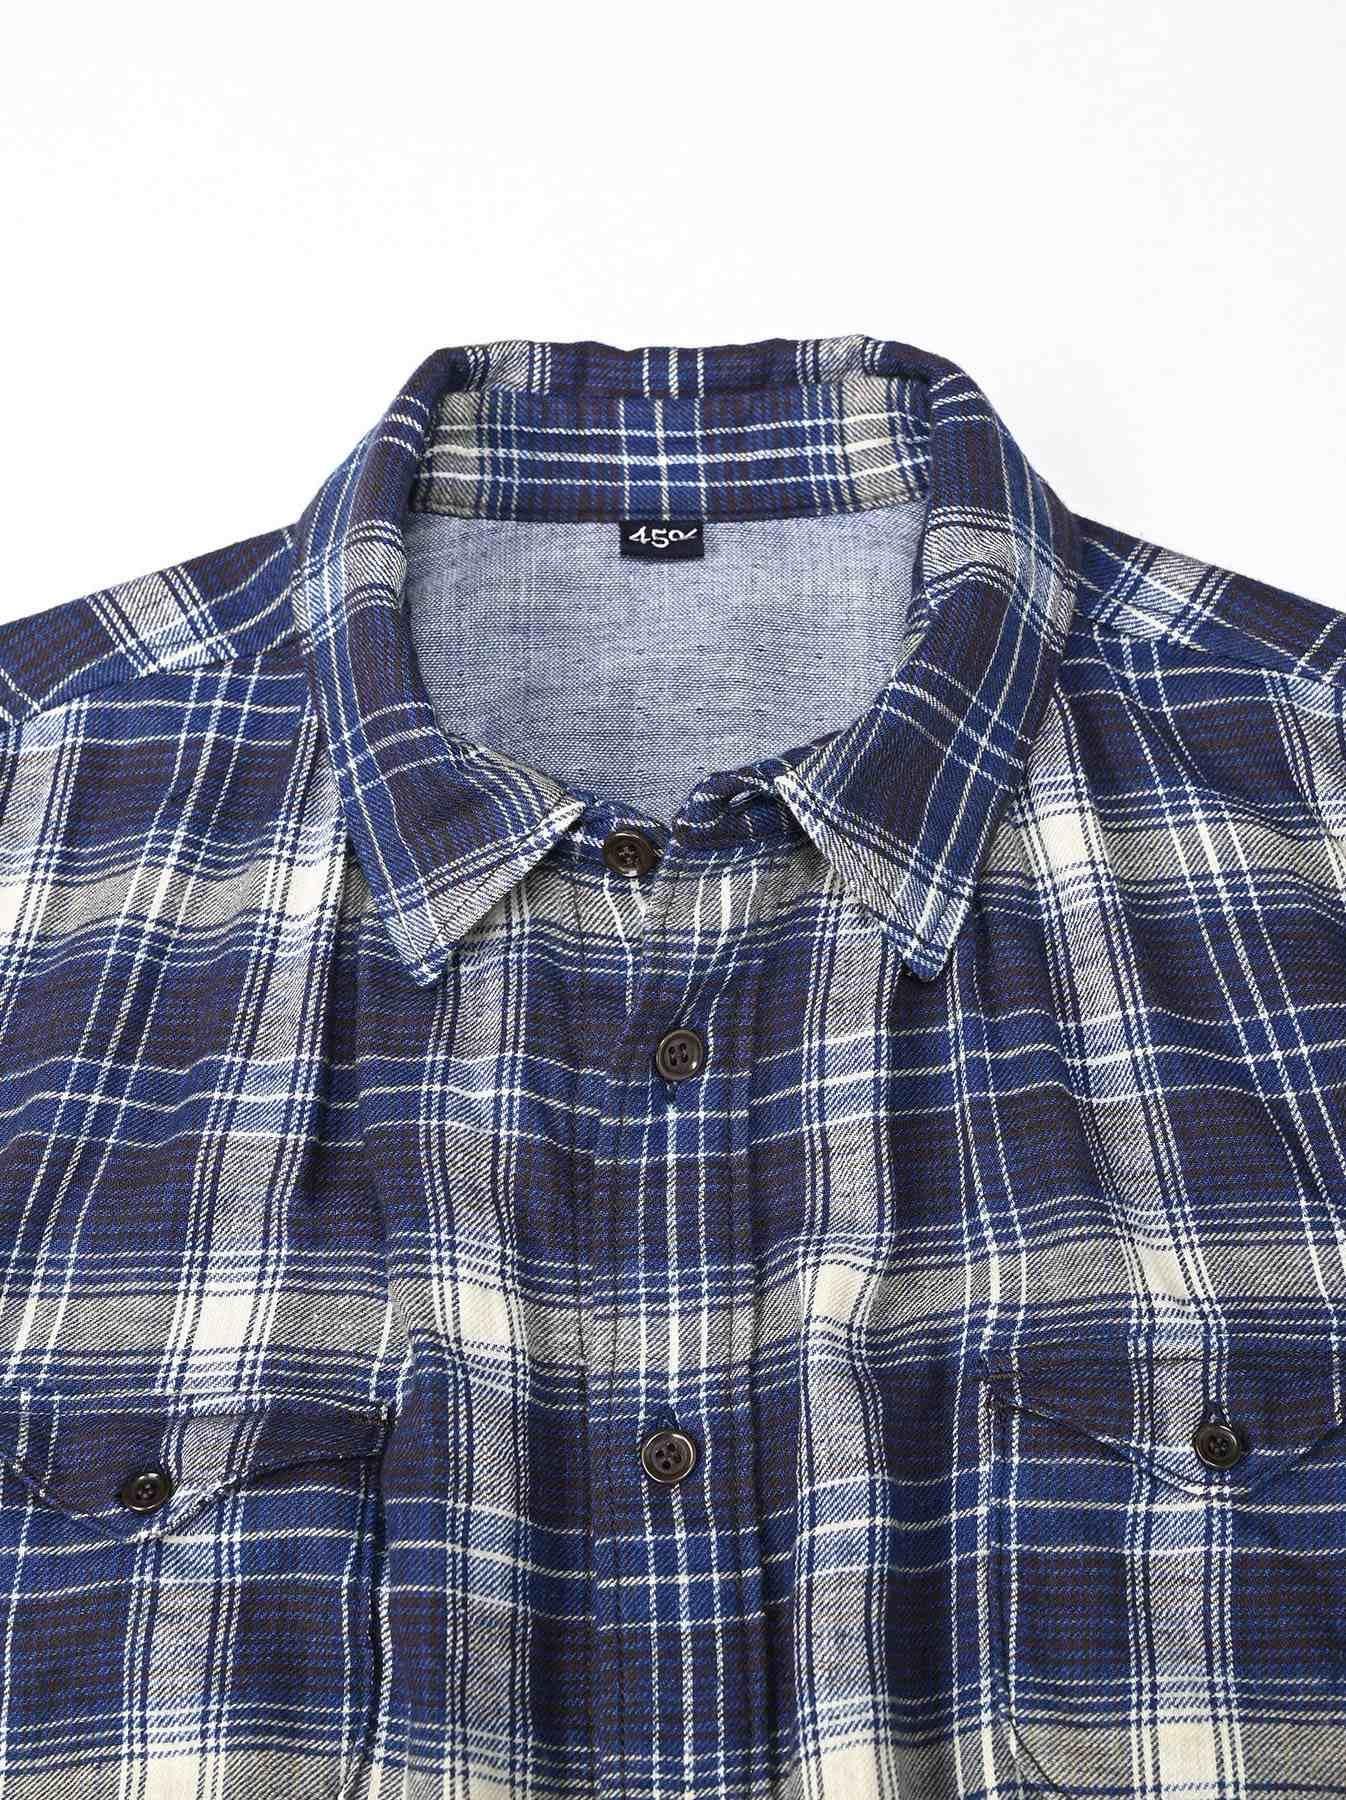 Indigo Twill Double Cloth Shirt Dress-6